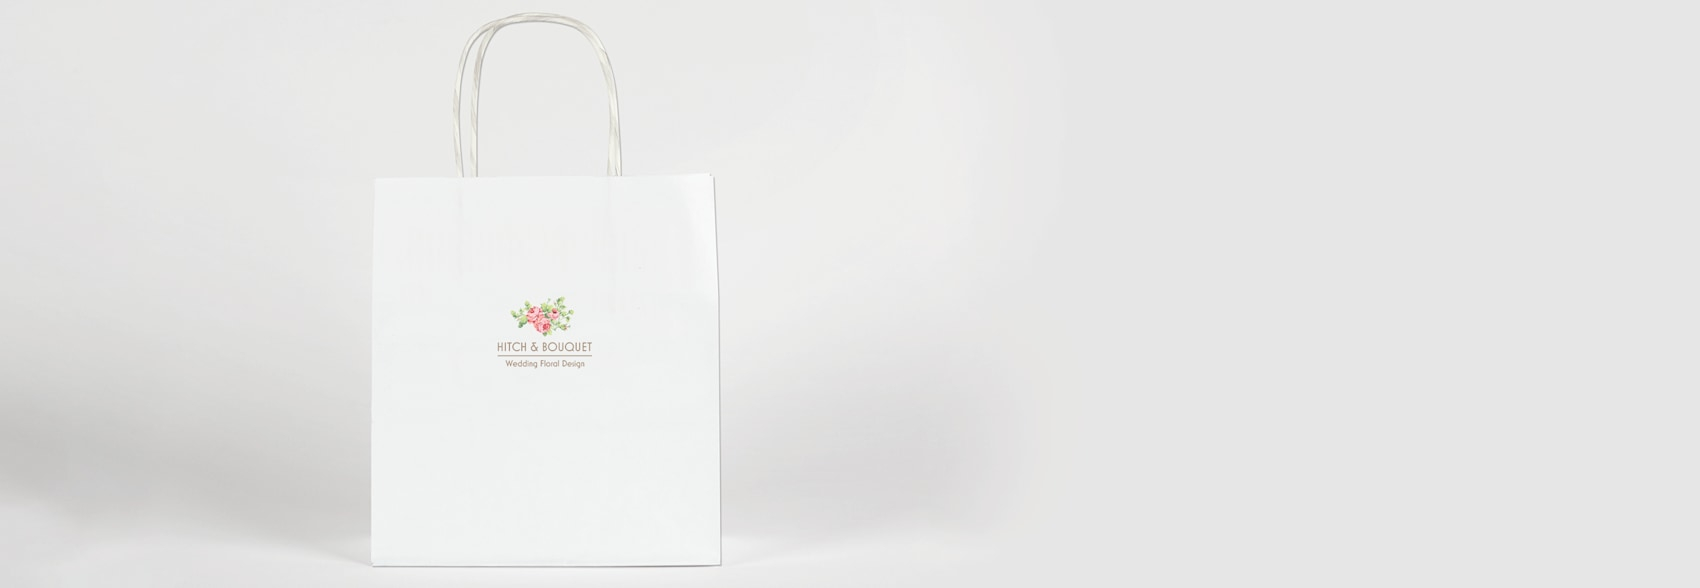 Printed paper bag with logo